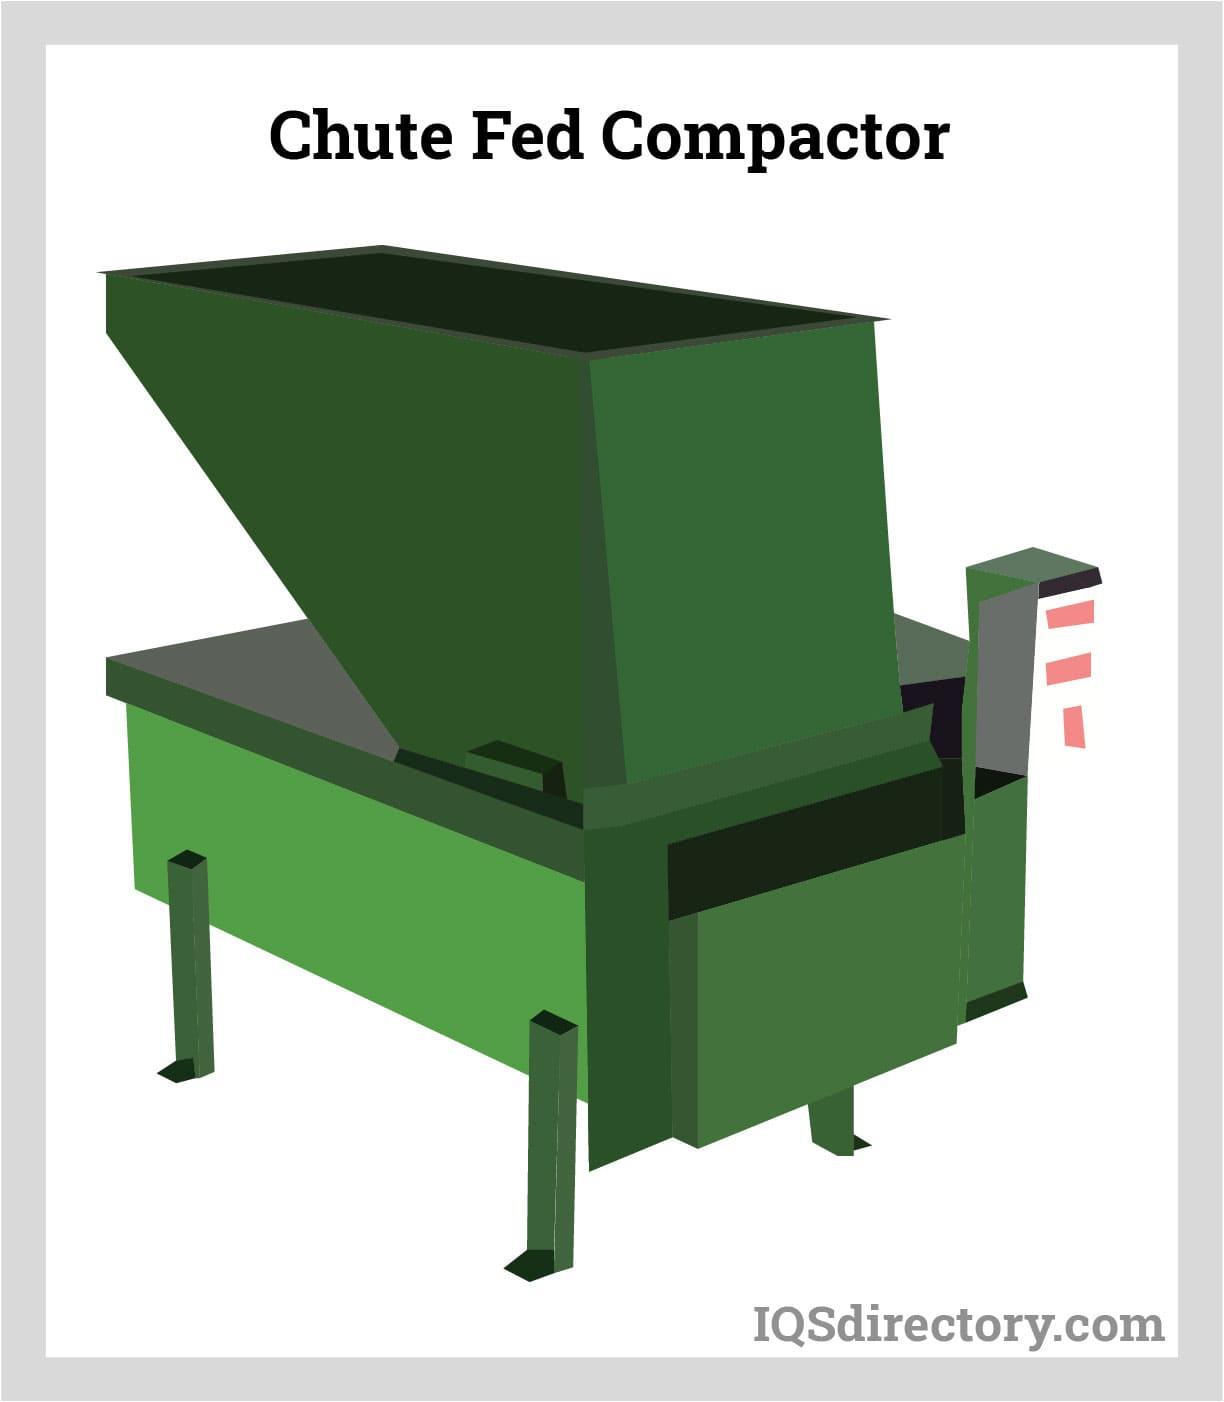 Chute Fed Compactor